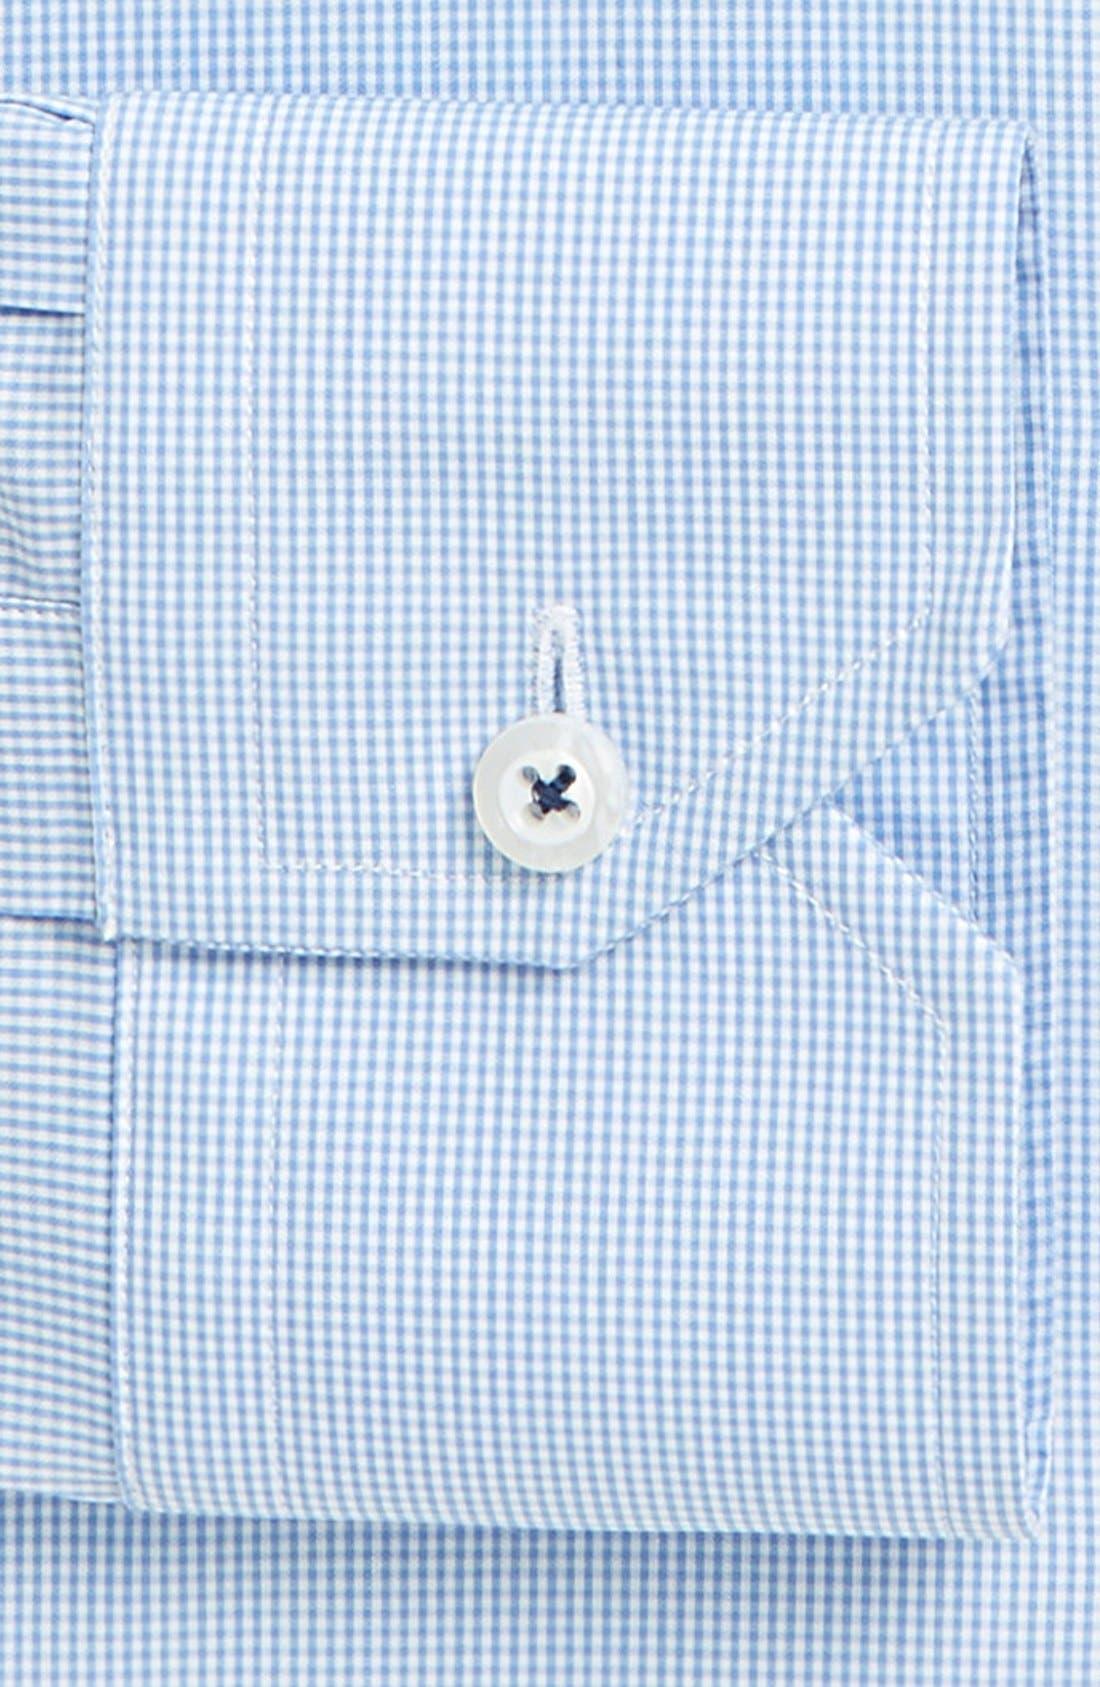 Classic Fit Micro Gingham Dress Shirt,                             Alternate thumbnail 2, color,                             Blue